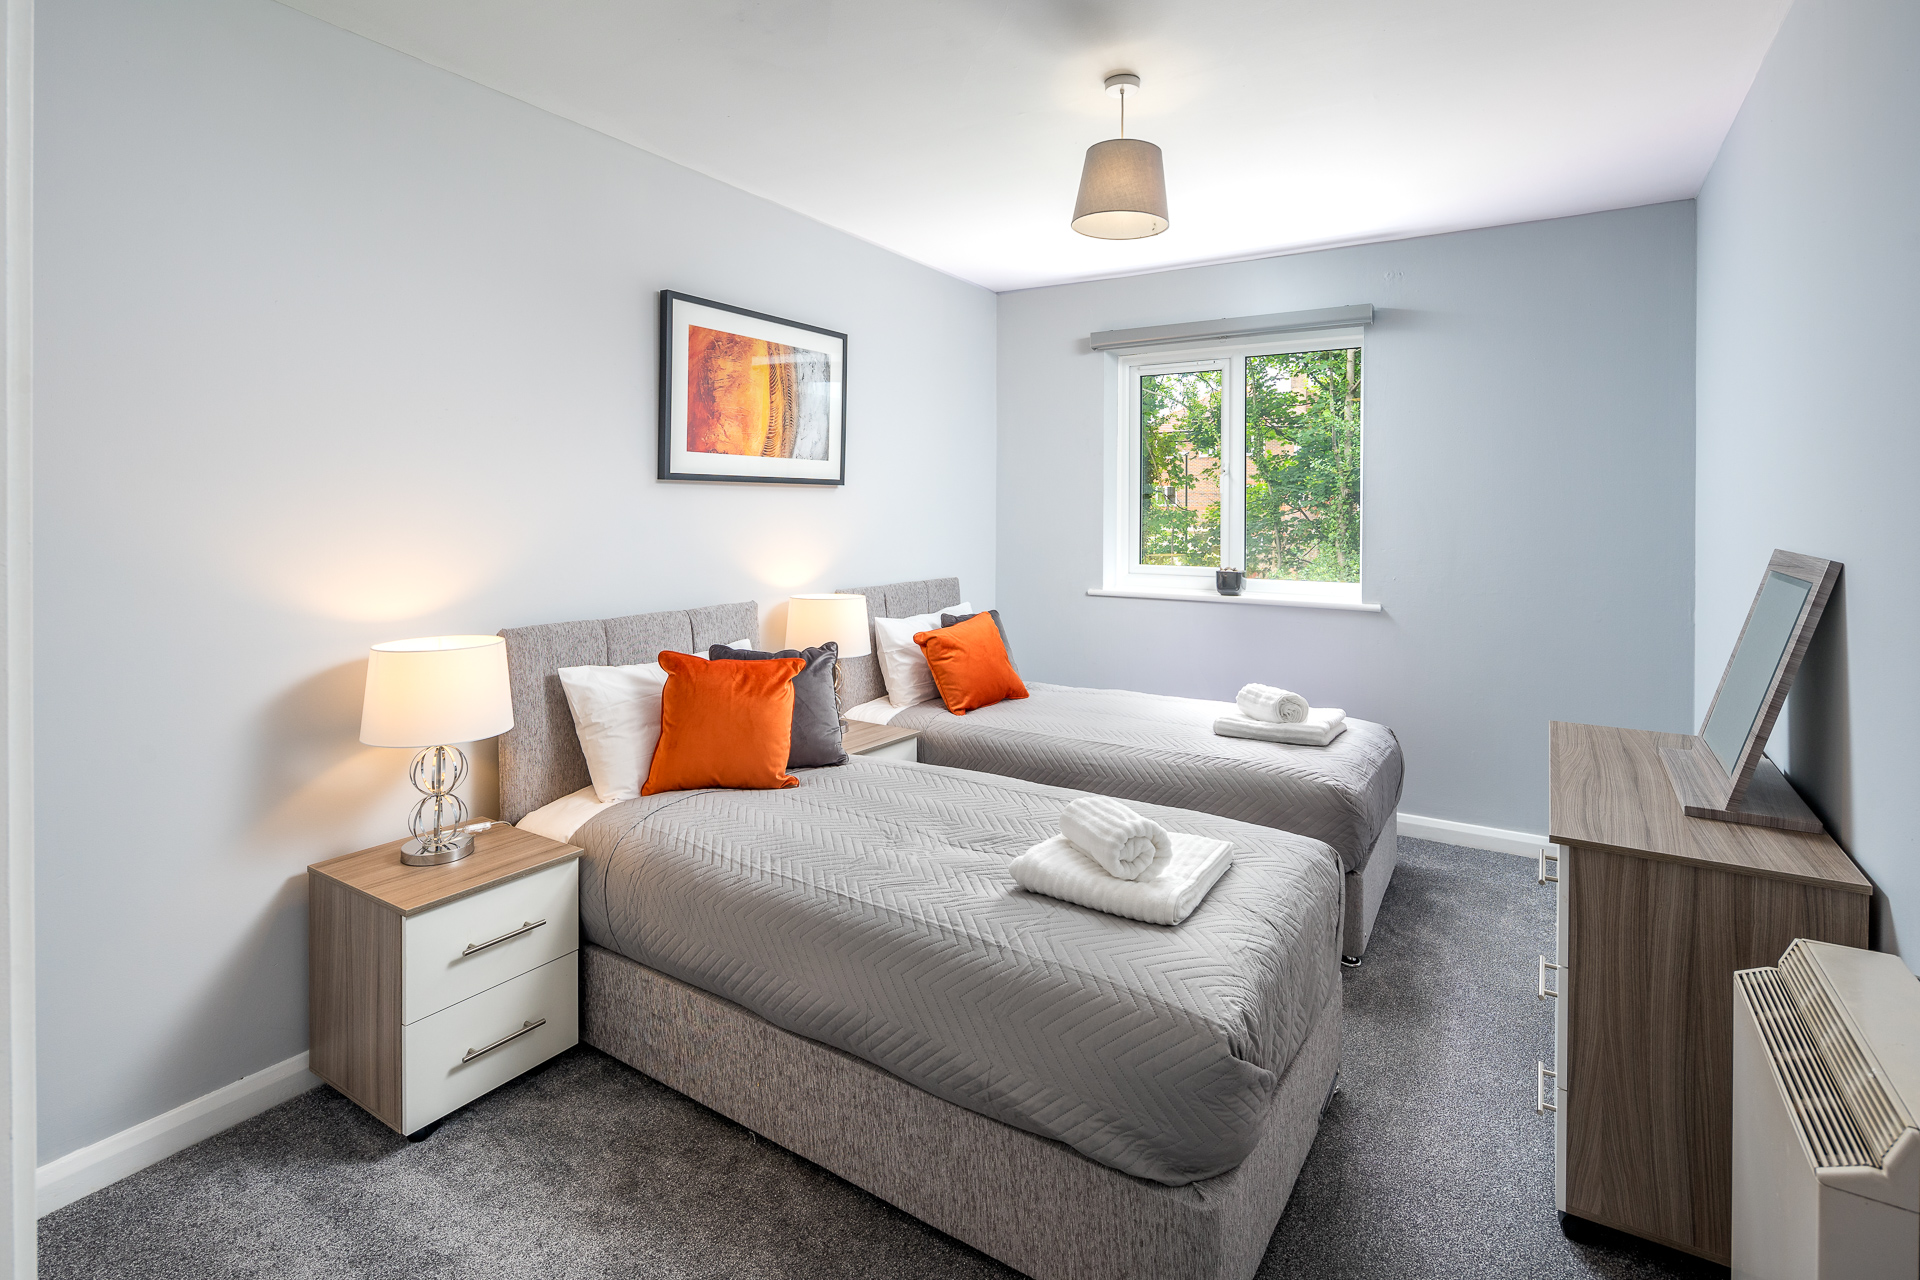 Bedroom at Crawley Centre Apartment, Southgate, Crawley